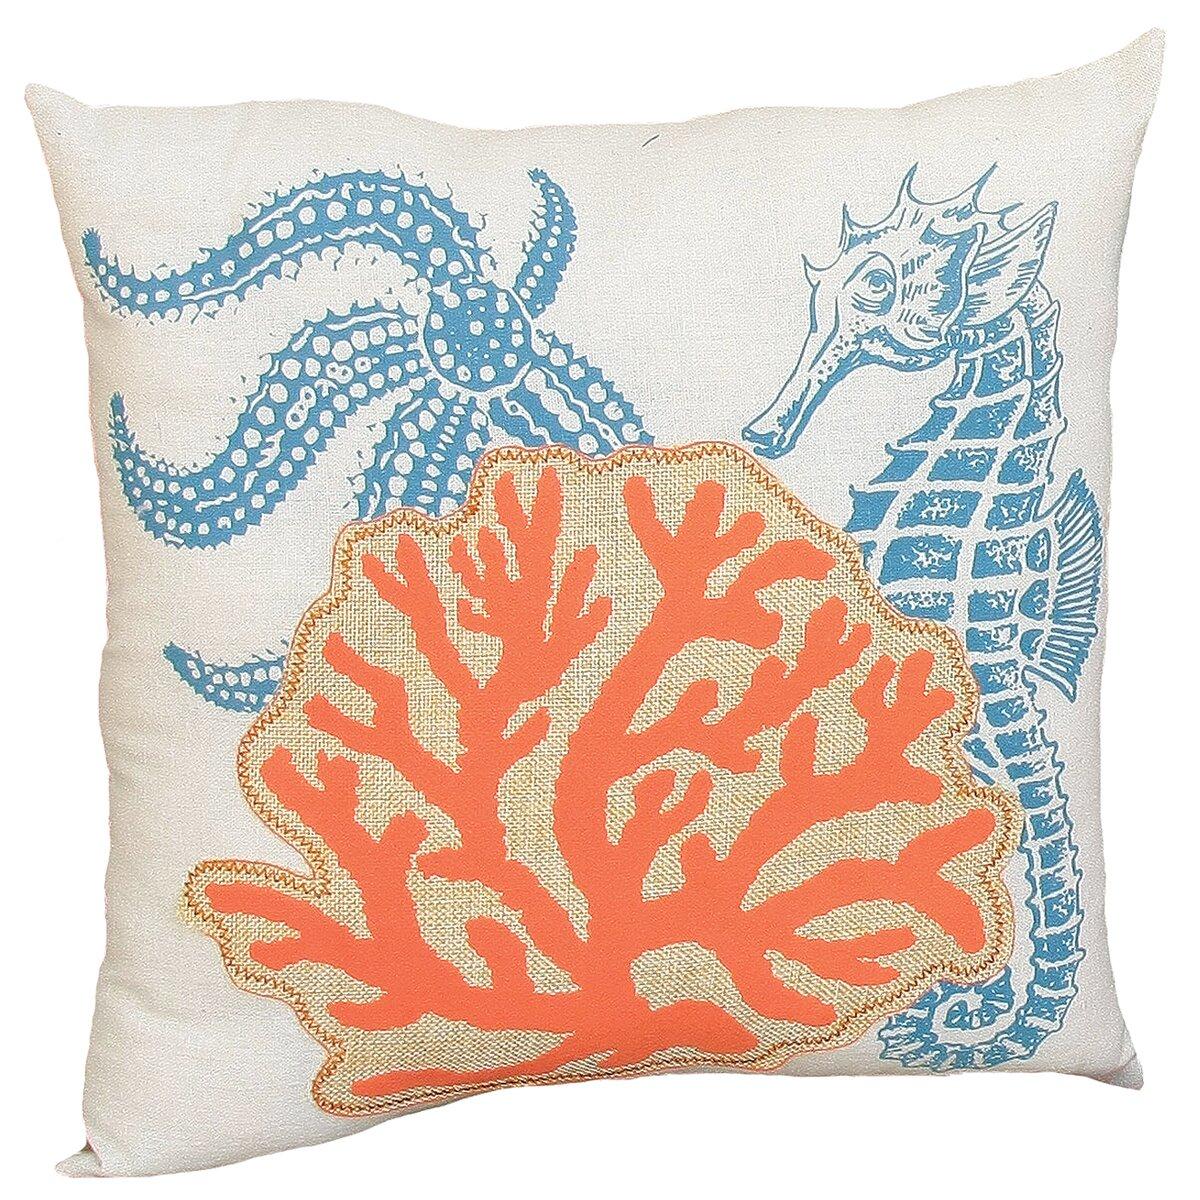 Xia Home Fashions Coastal Applique Sea Life and Coral Decorative Throw Pillow & Reviews Wayfair